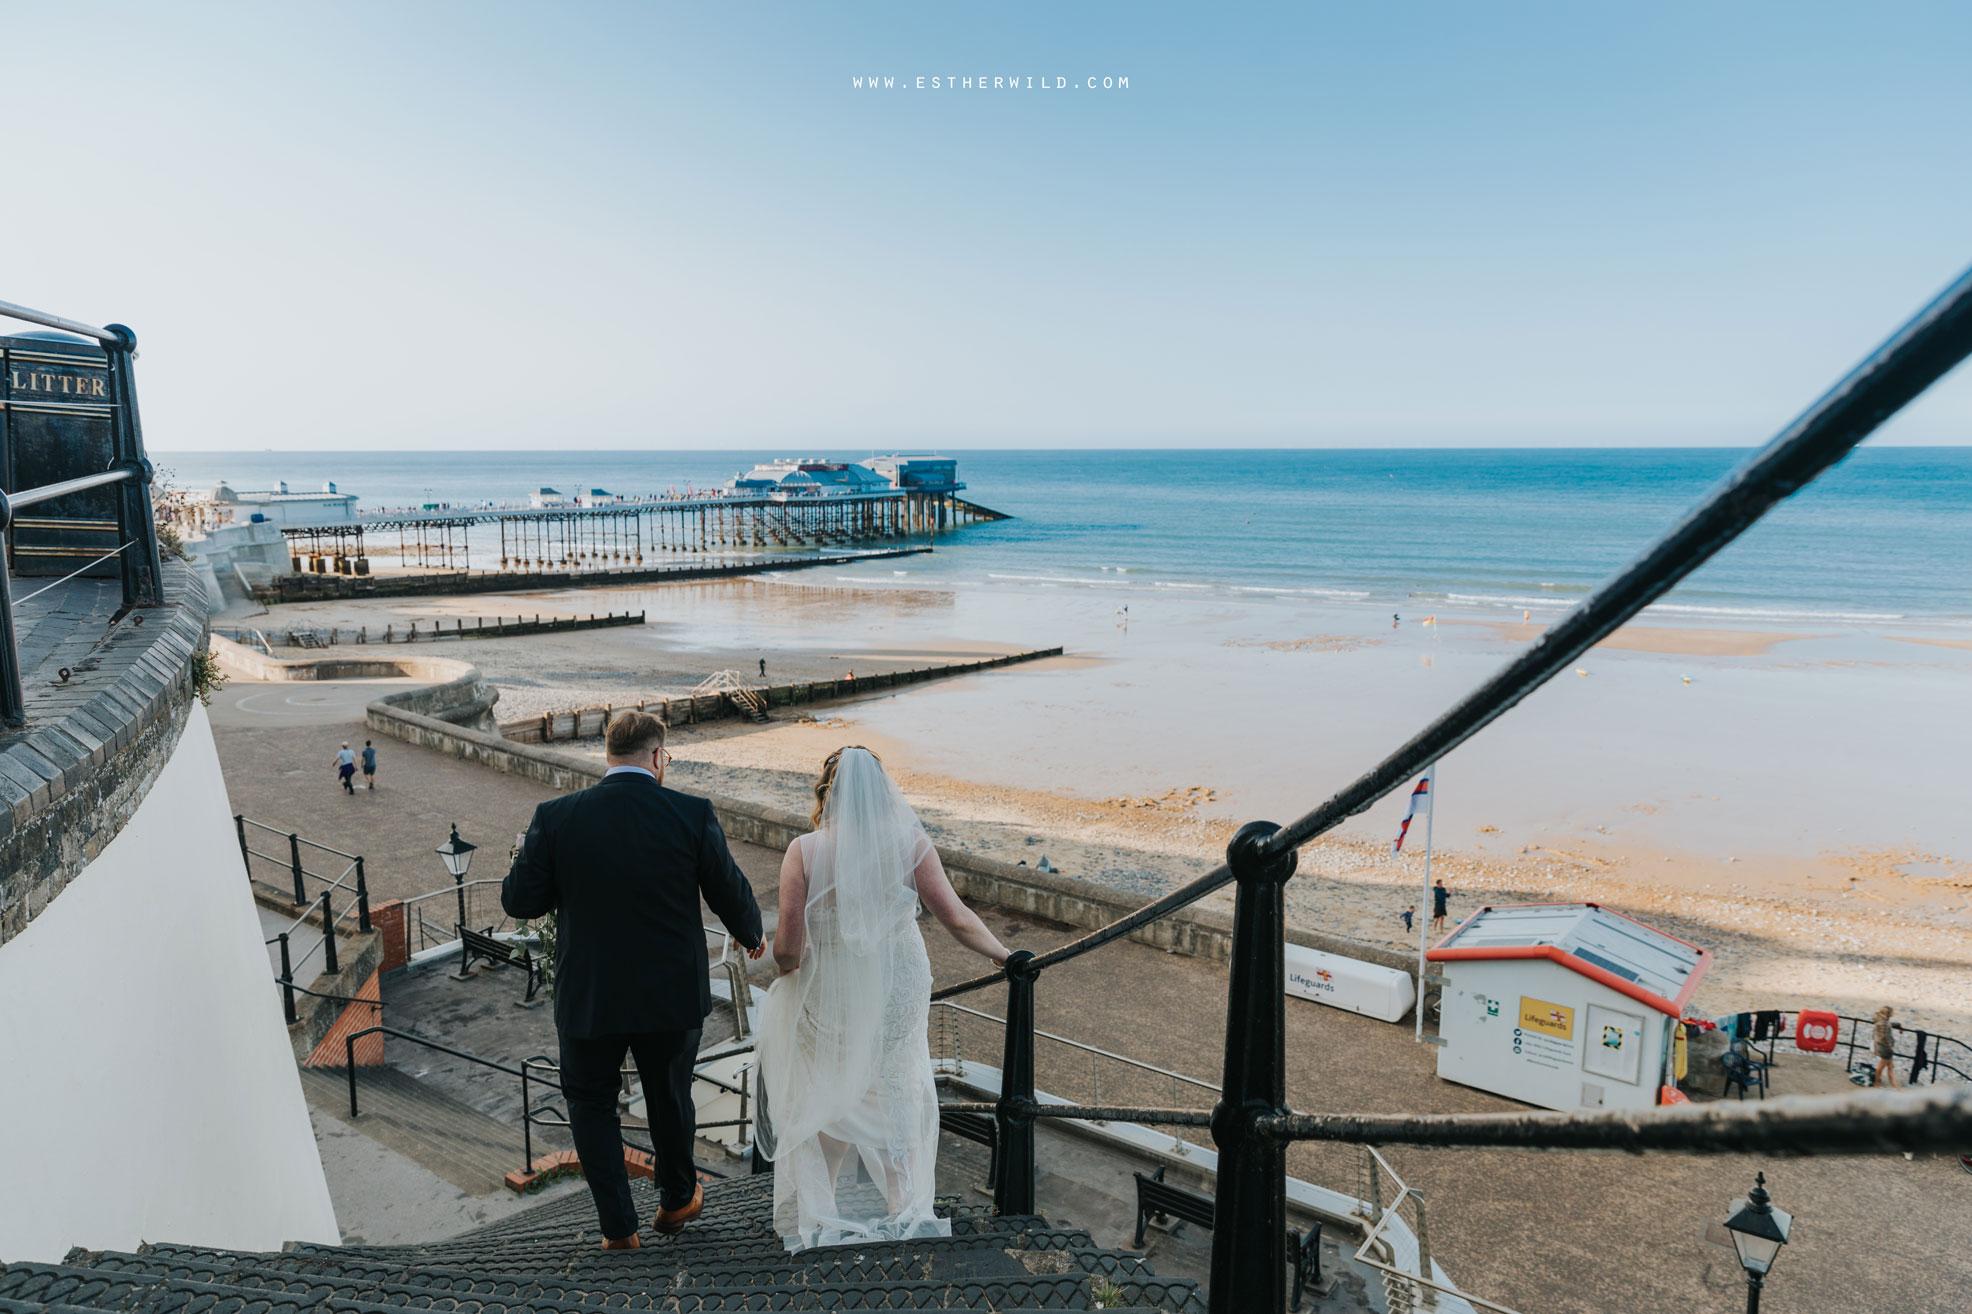 Cromer_Wedding_Beach_Outdoor_Ceremony_Norfolk_North_Lodge_Registry_Office_Rocket_House_Cafe_Cromer_Pier_IMG_4551.jpg